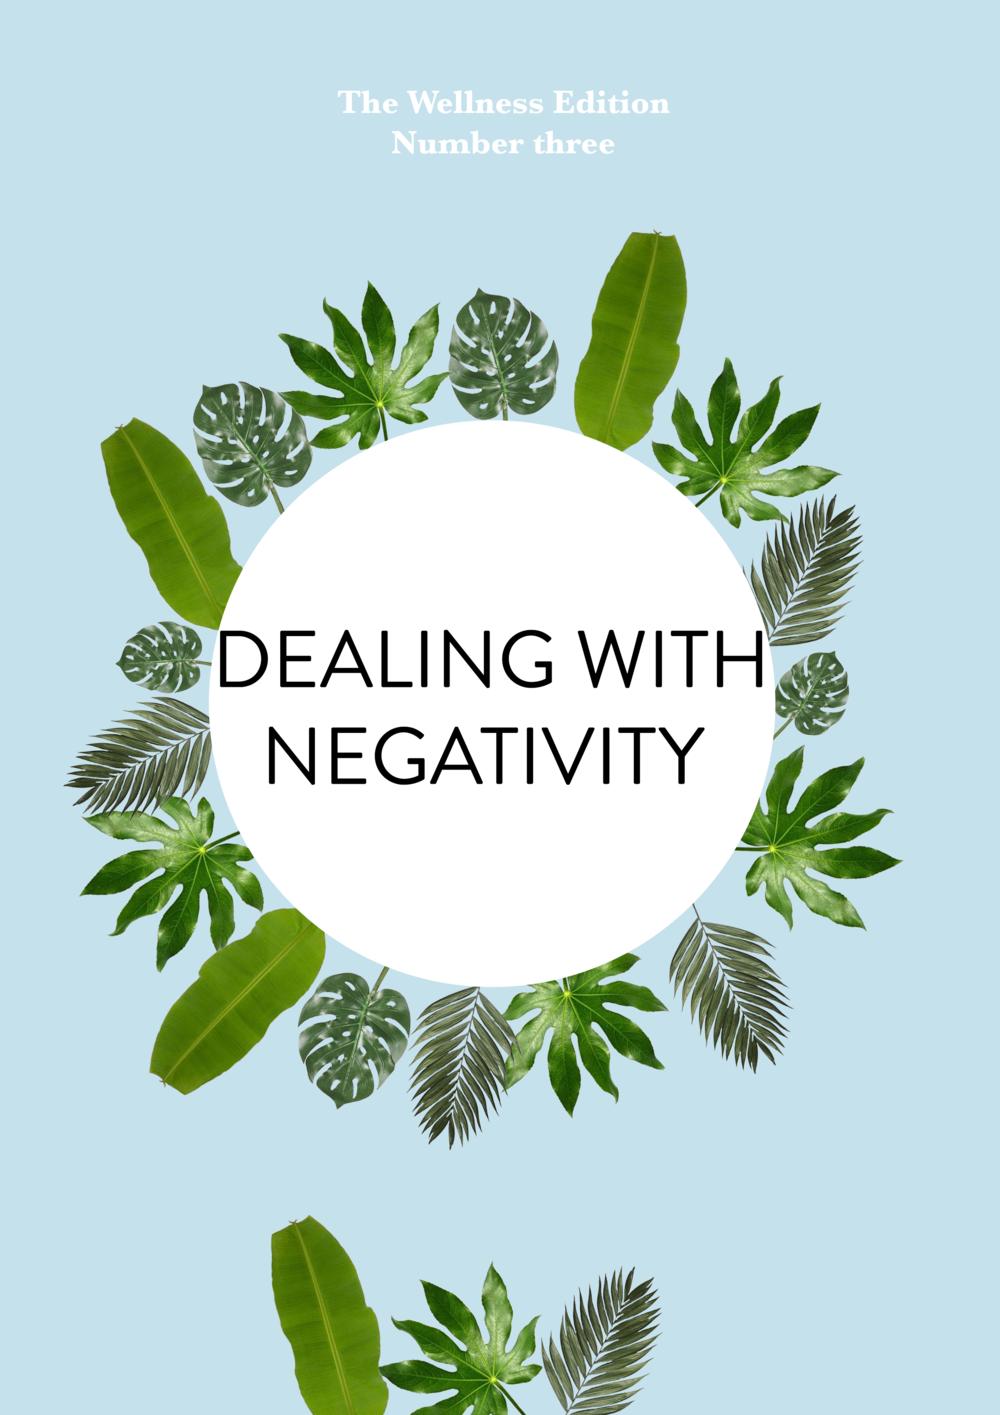 dealing_negativity_circle.png